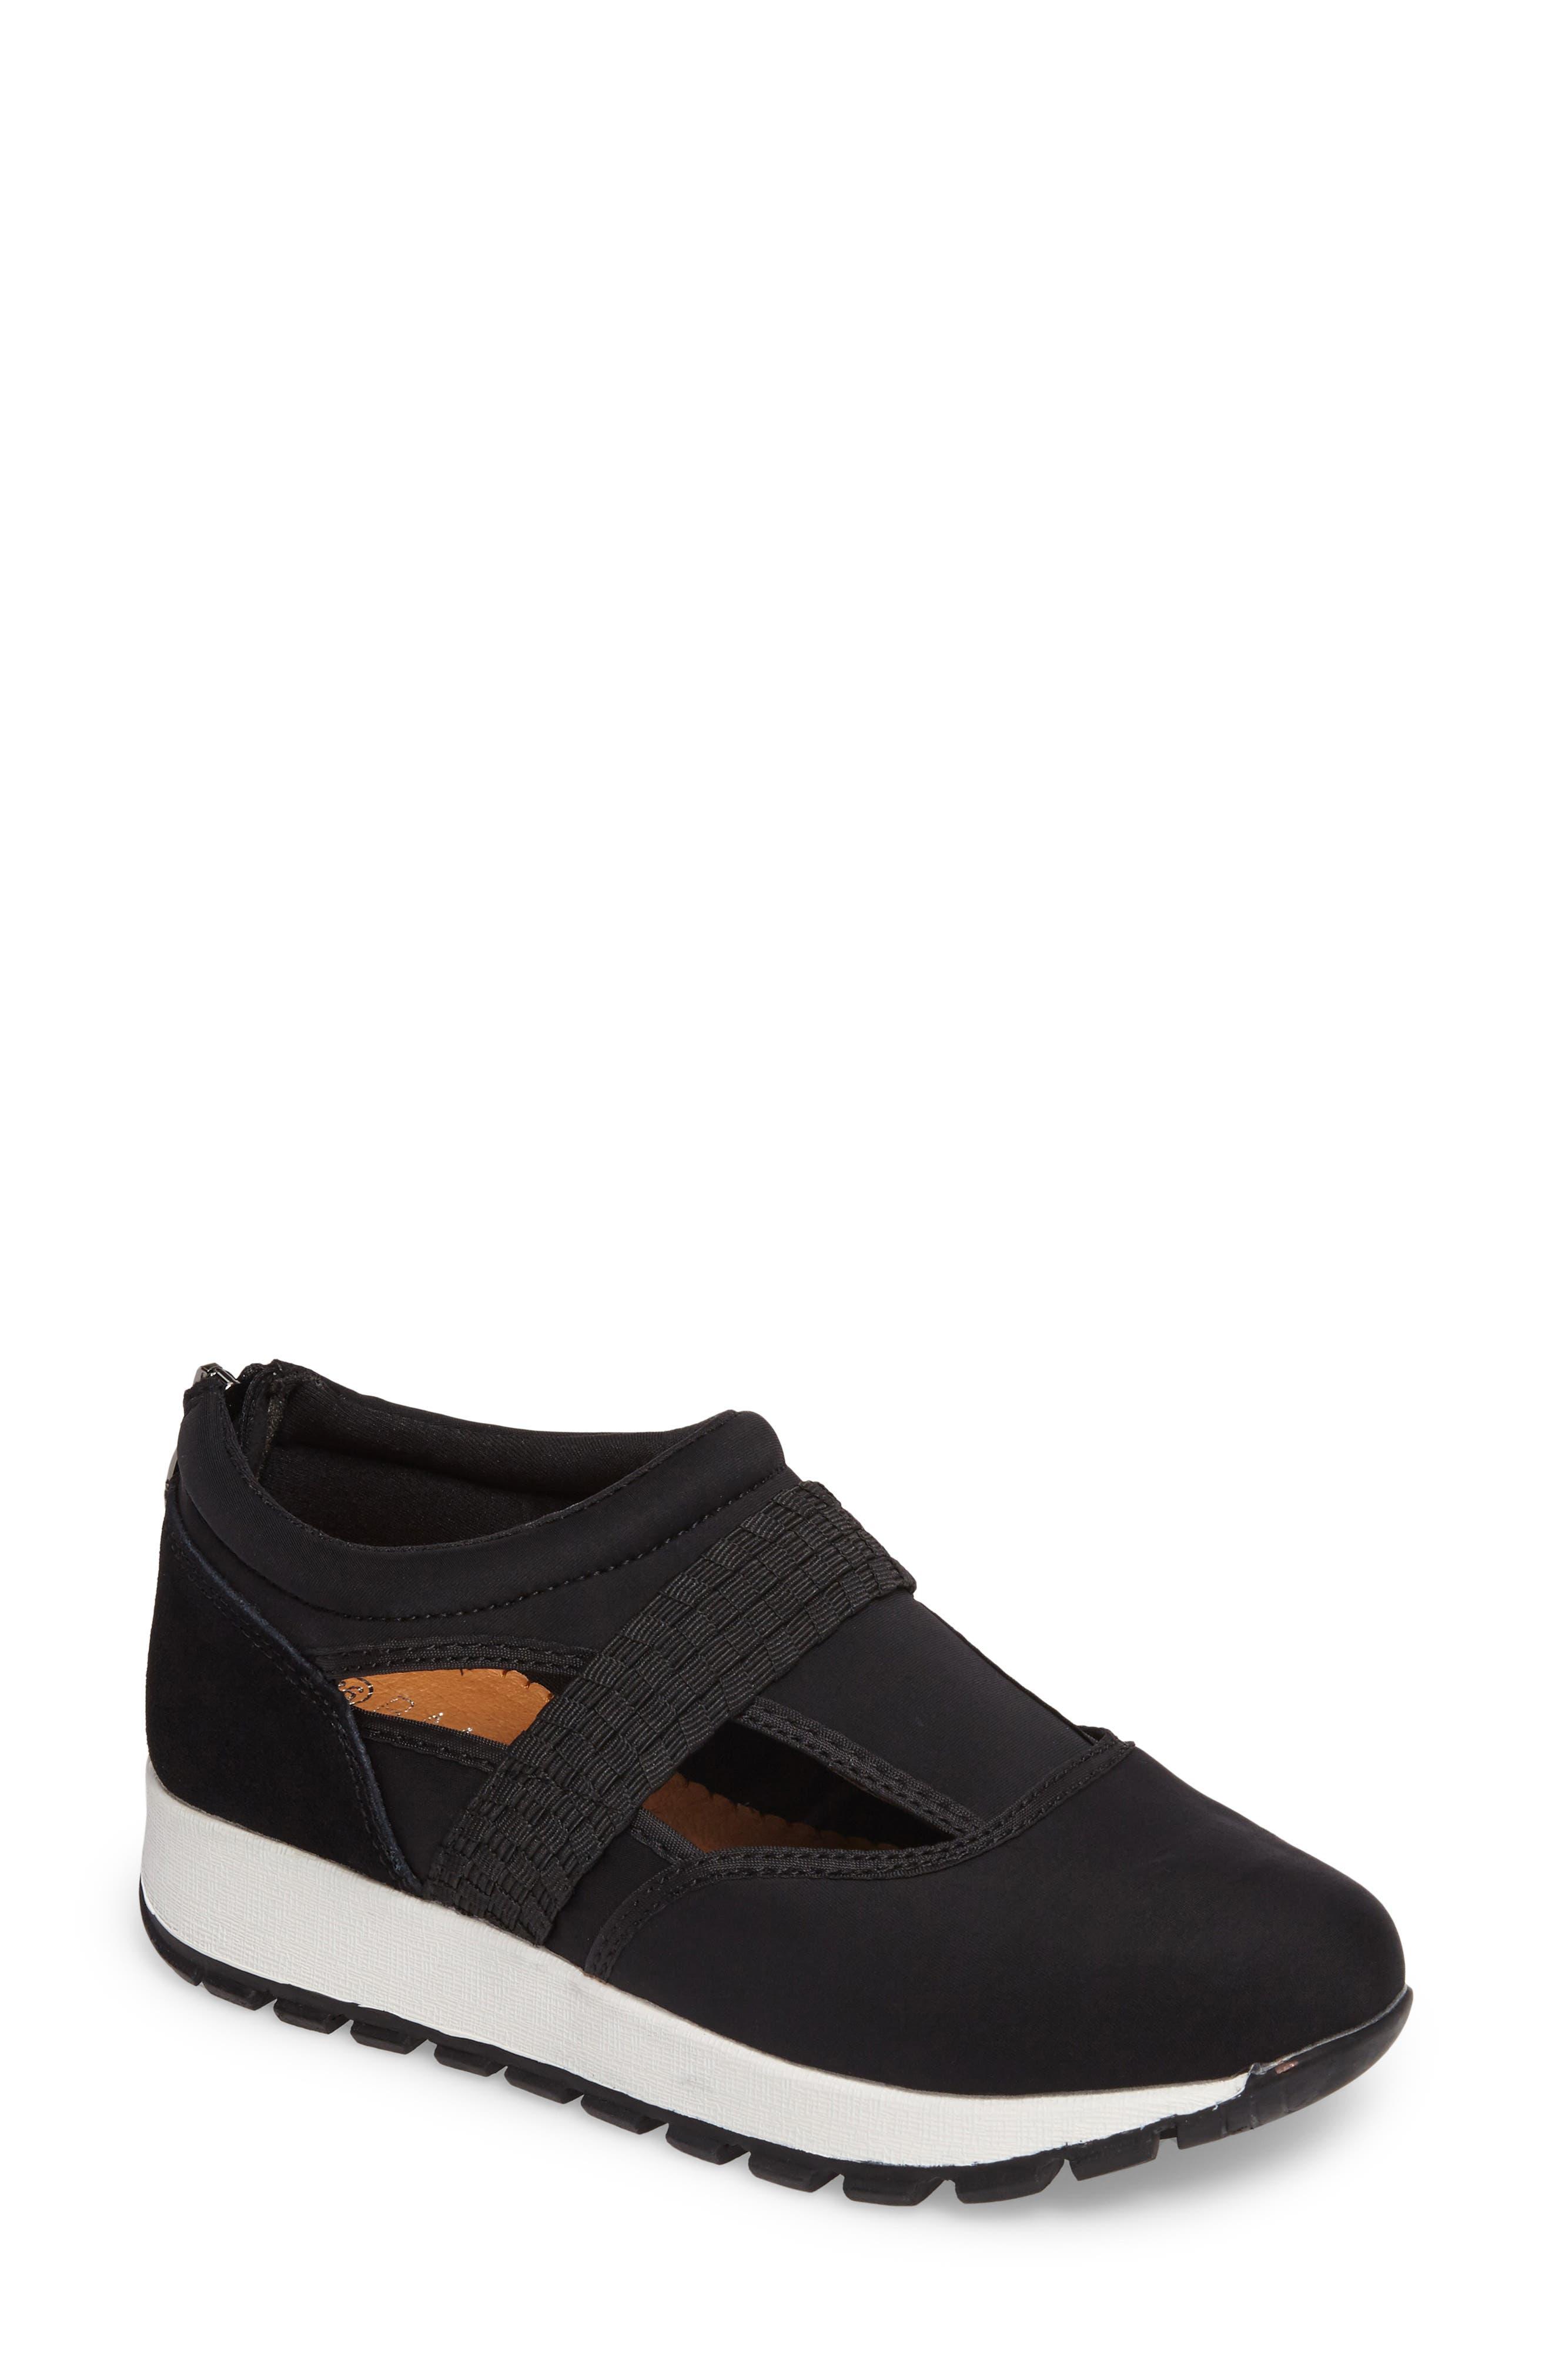 BERNIE MEV., Bernie Mev Janelle Sneaker, Main thumbnail 1, color, BLACK FABRIC